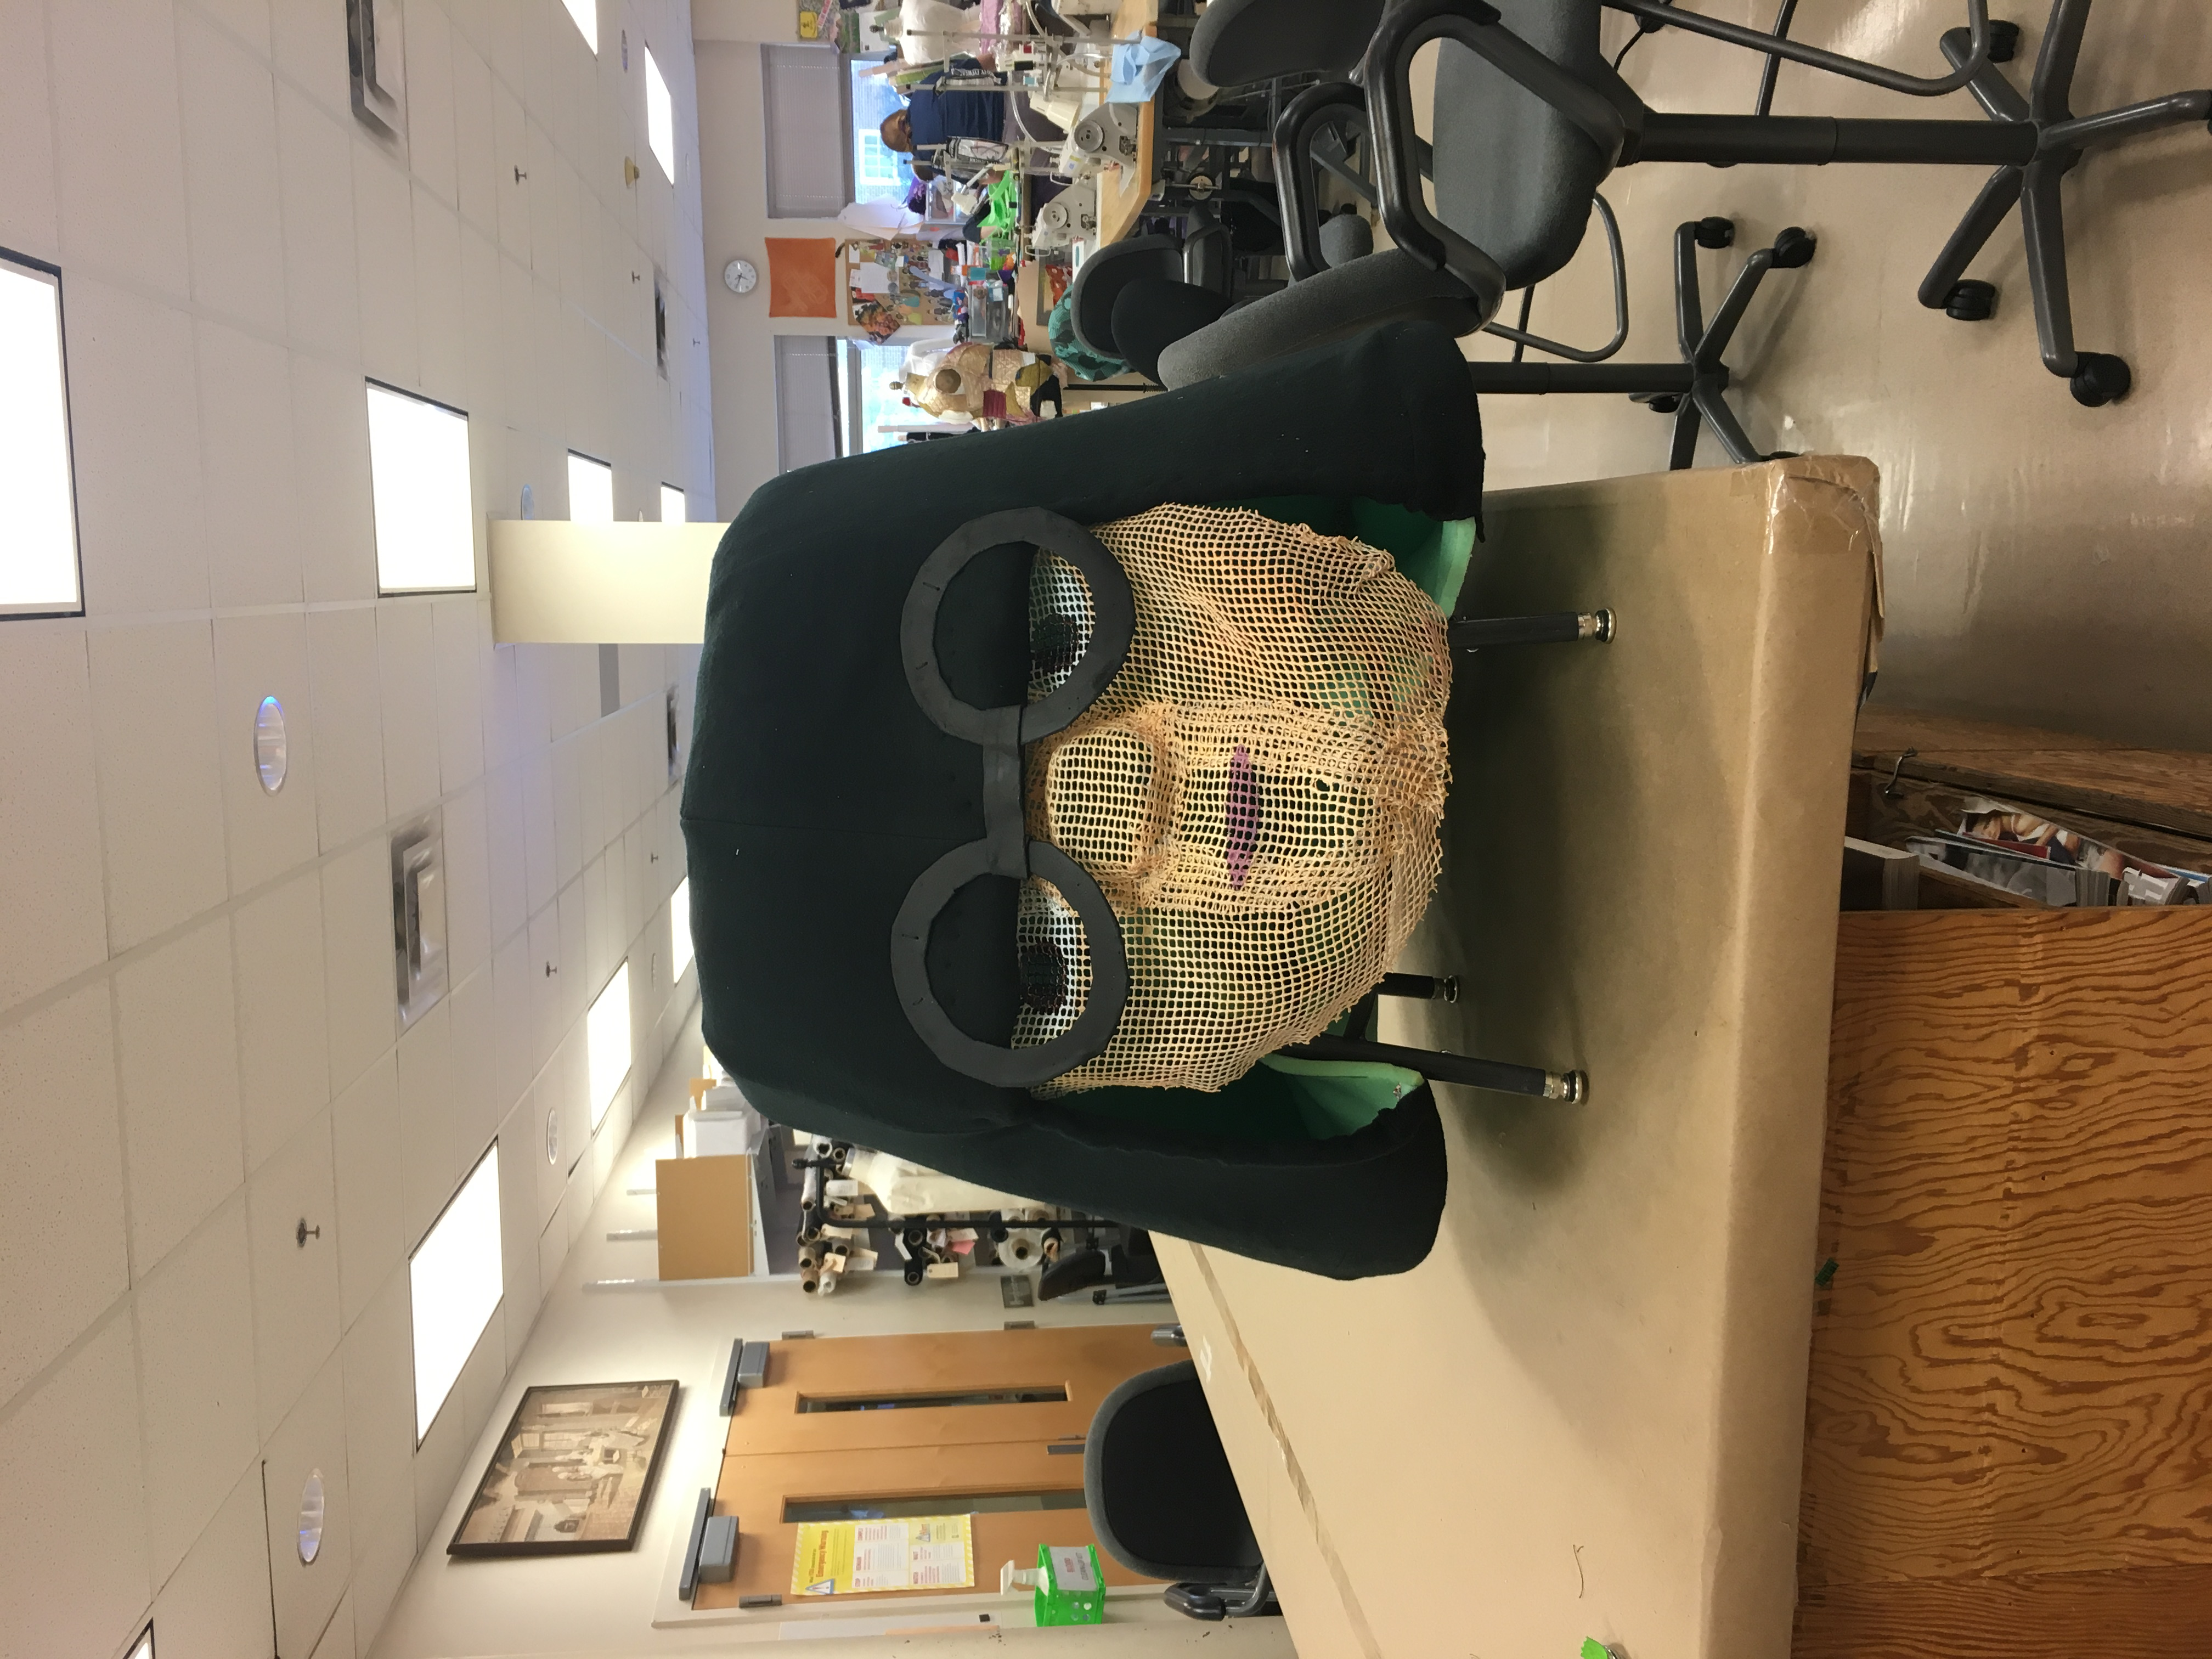 Mascot Head